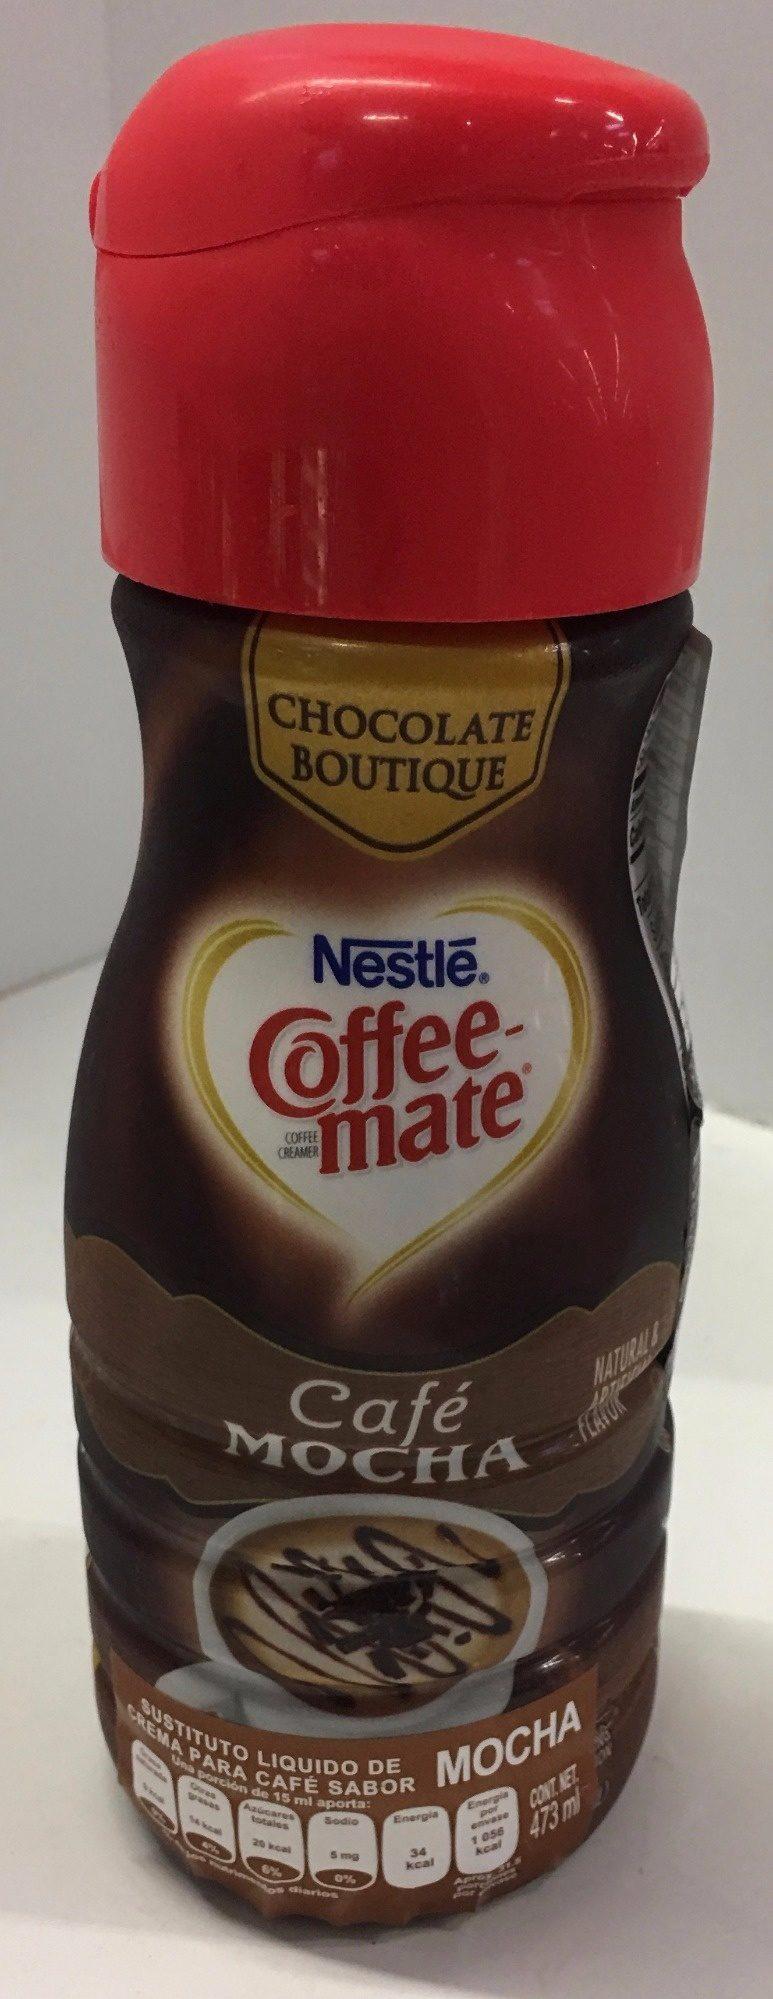 Coffee Mate Mocha - Product - es